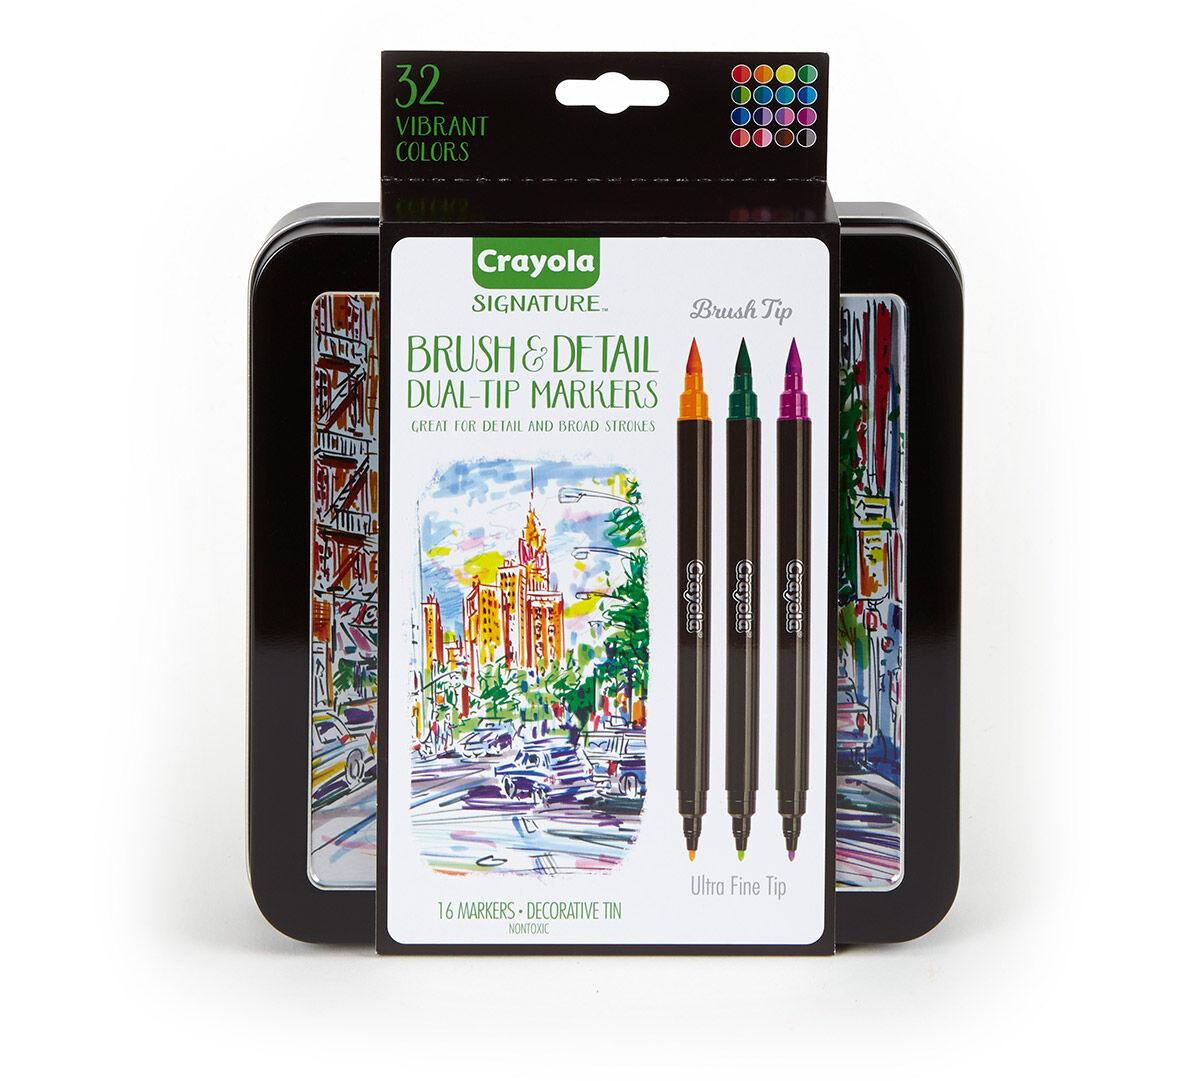 crayola art set with case